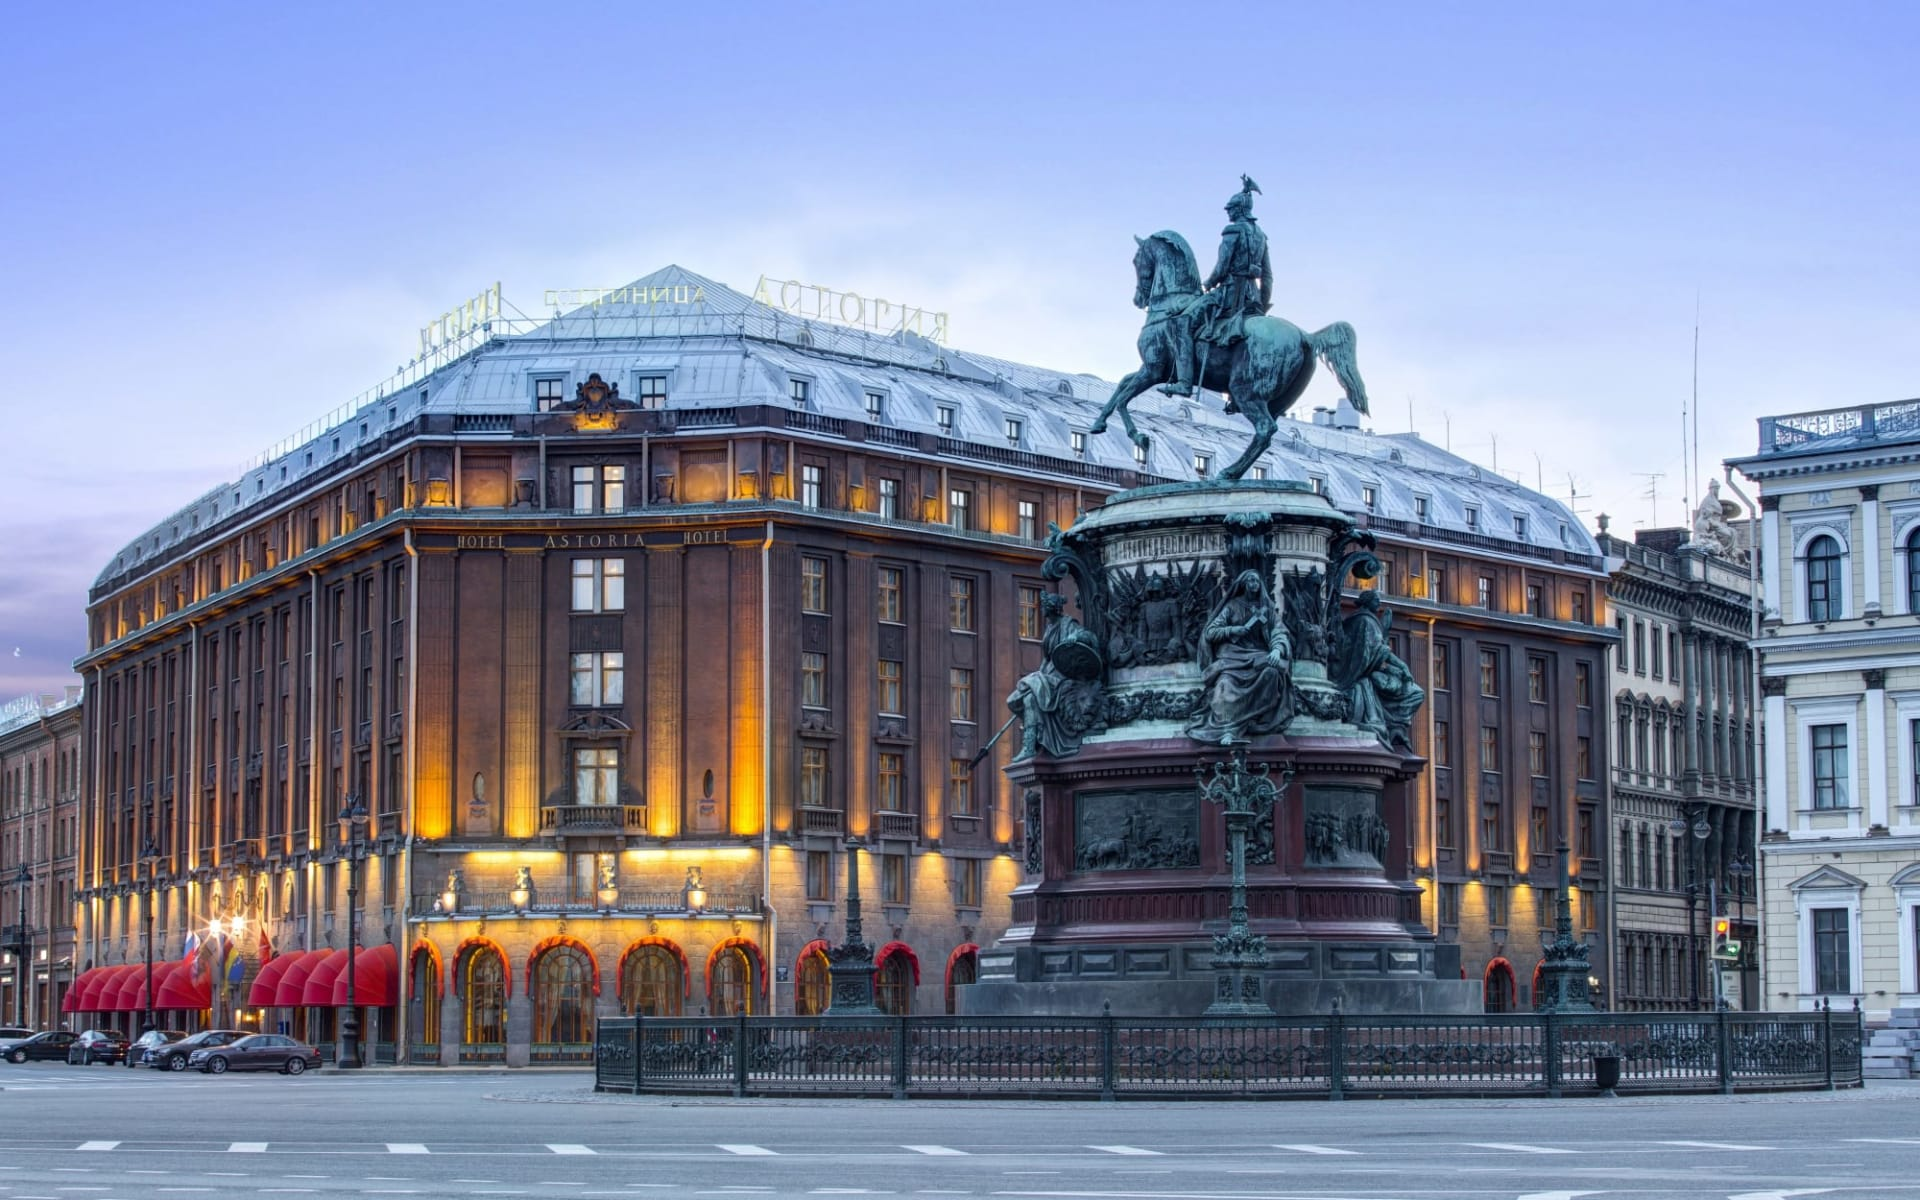 Hotel Astoria in St. Petersburg: Russland_St.Petersburg_Astoria_Aussen